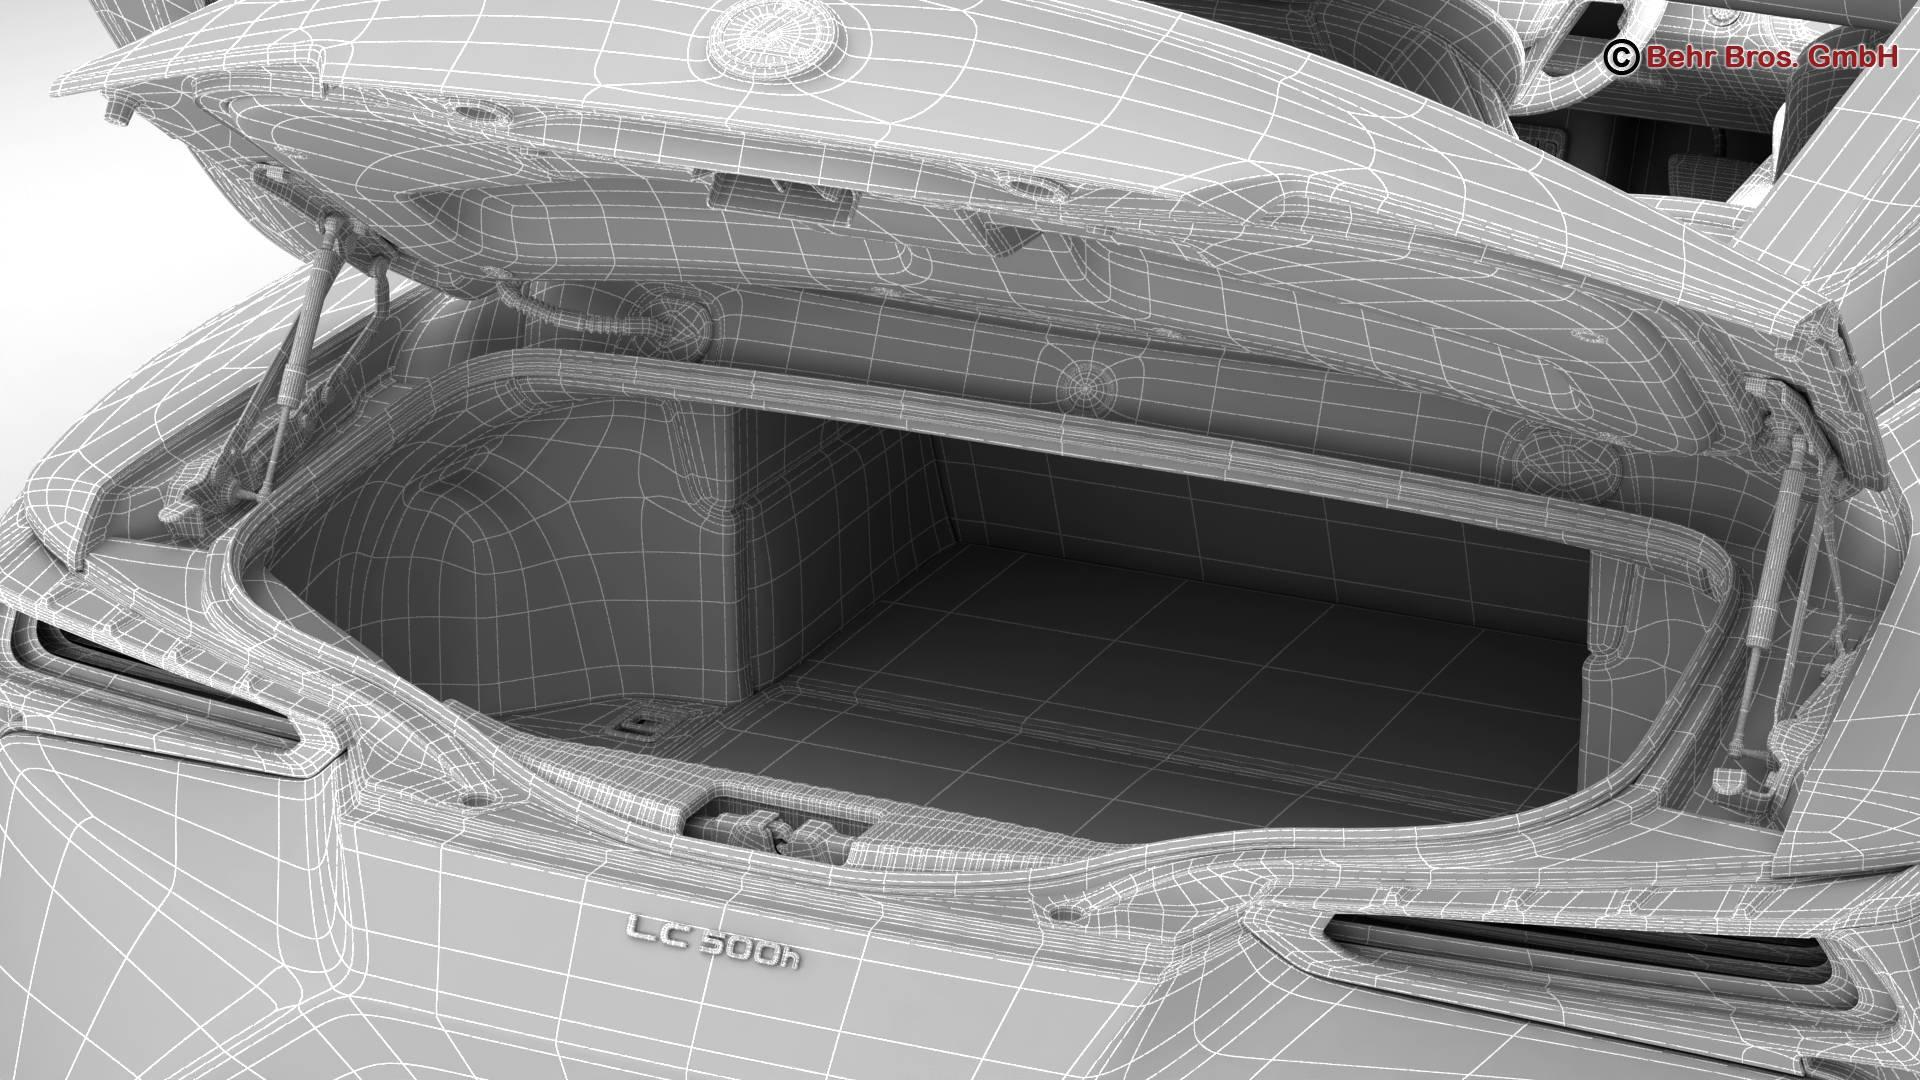 lexus lc 500 us hybrid 2018 3d model 3ds max fbx c4d lwo ma mb obj 267957